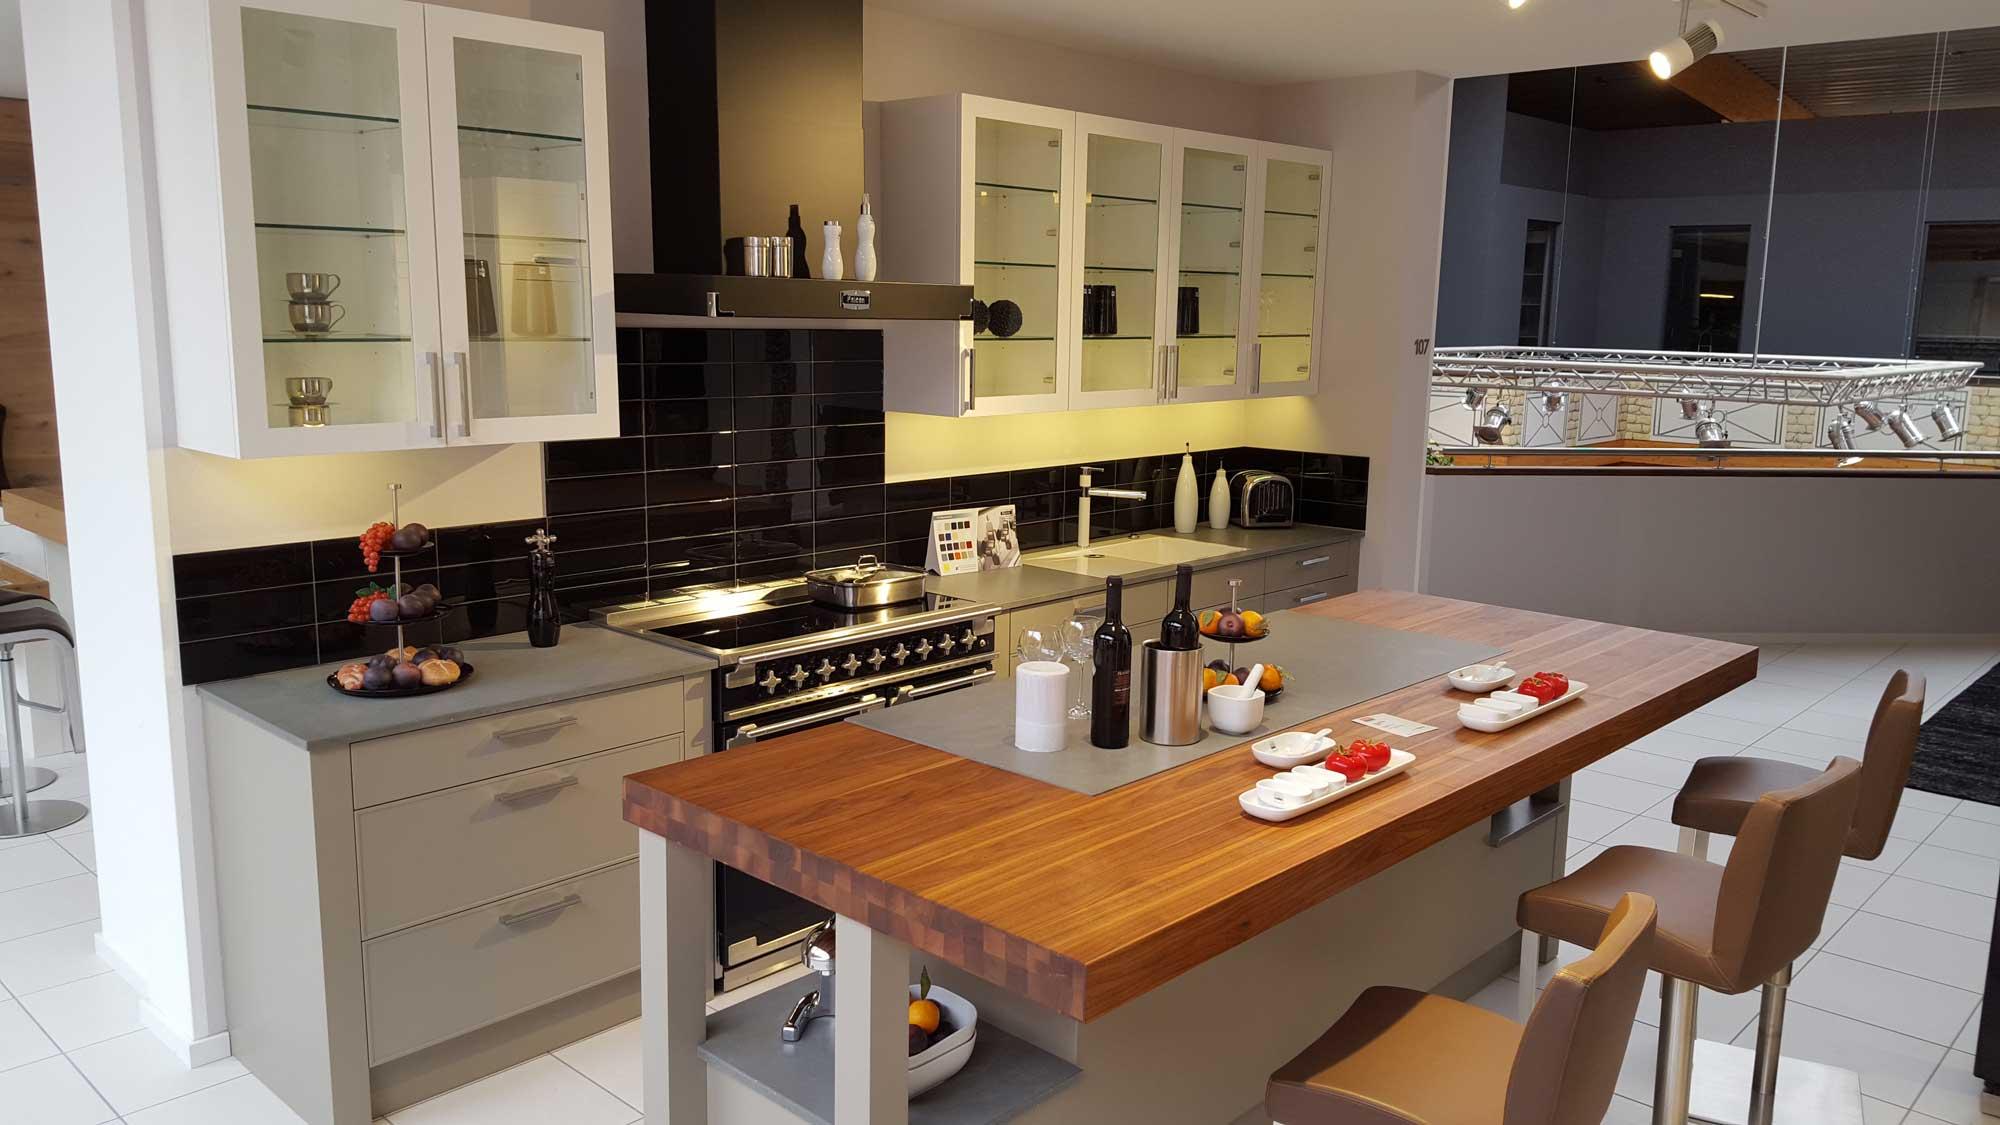 beton quarz concreto grey arbeitsplatte arbeitsplatten k chenarbeitsplatten. Black Bedroom Furniture Sets. Home Design Ideas